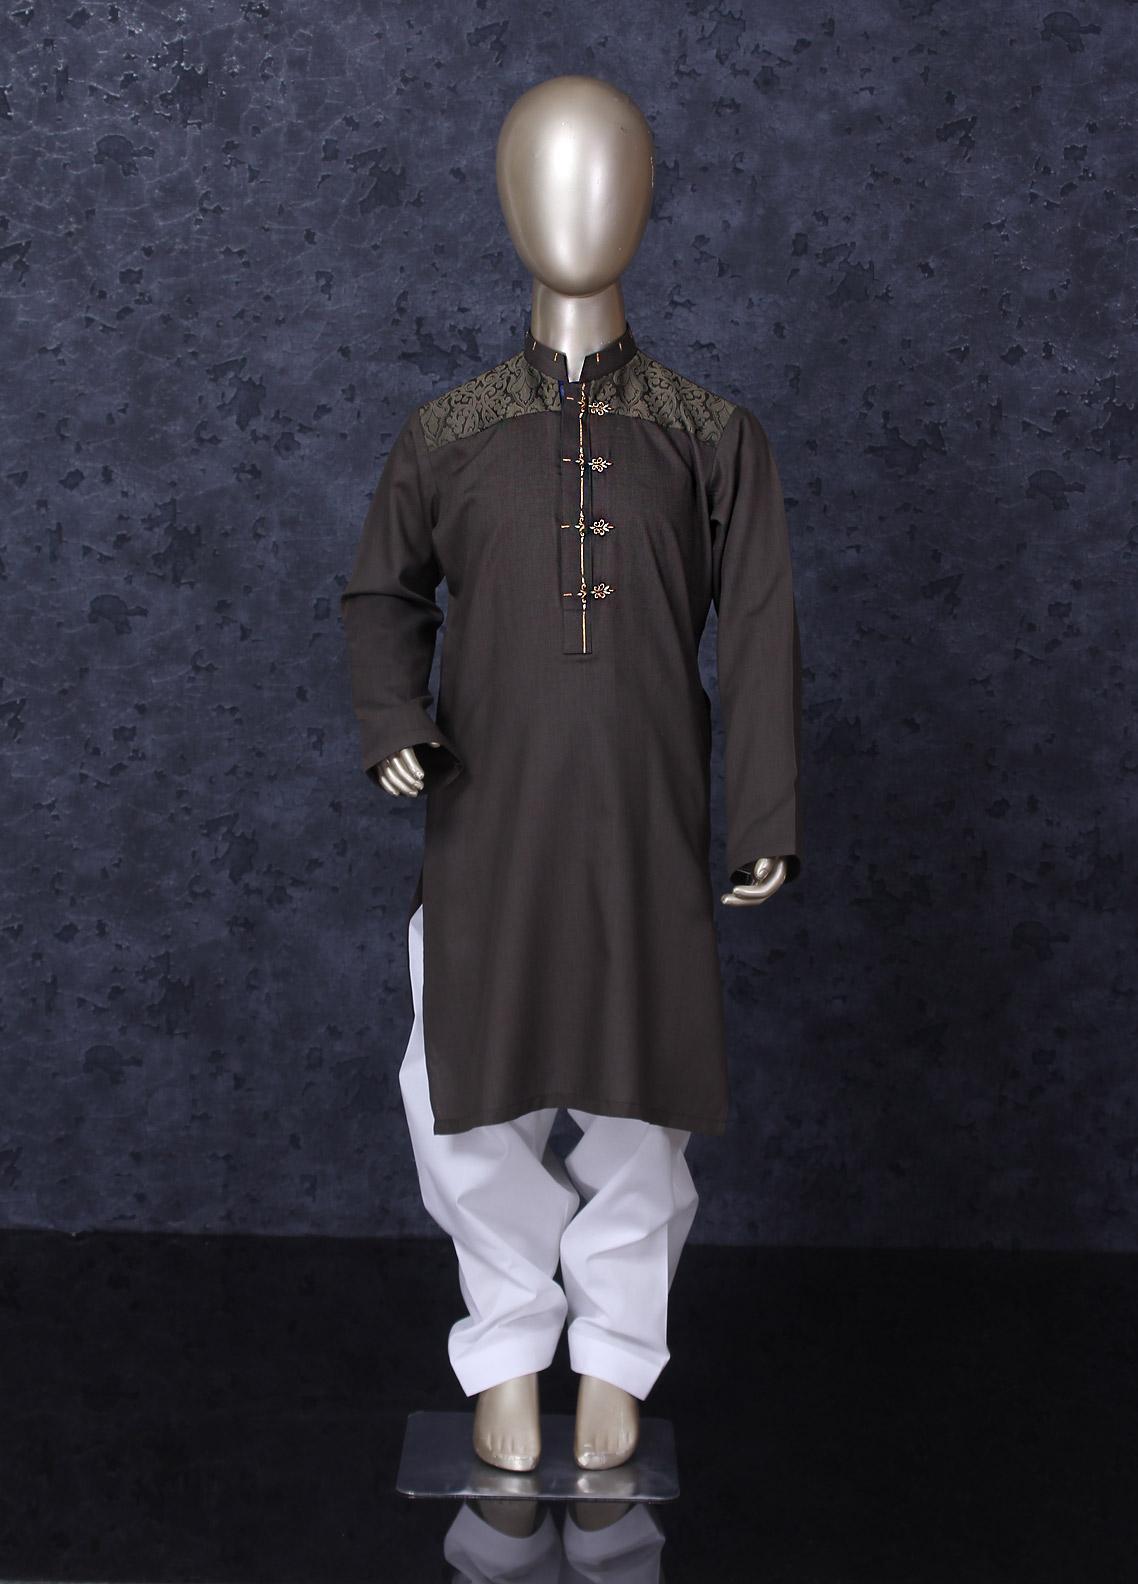 Aizaz Zafar Cotton Formal Boys Kameez Shalwar -  D-247 Green